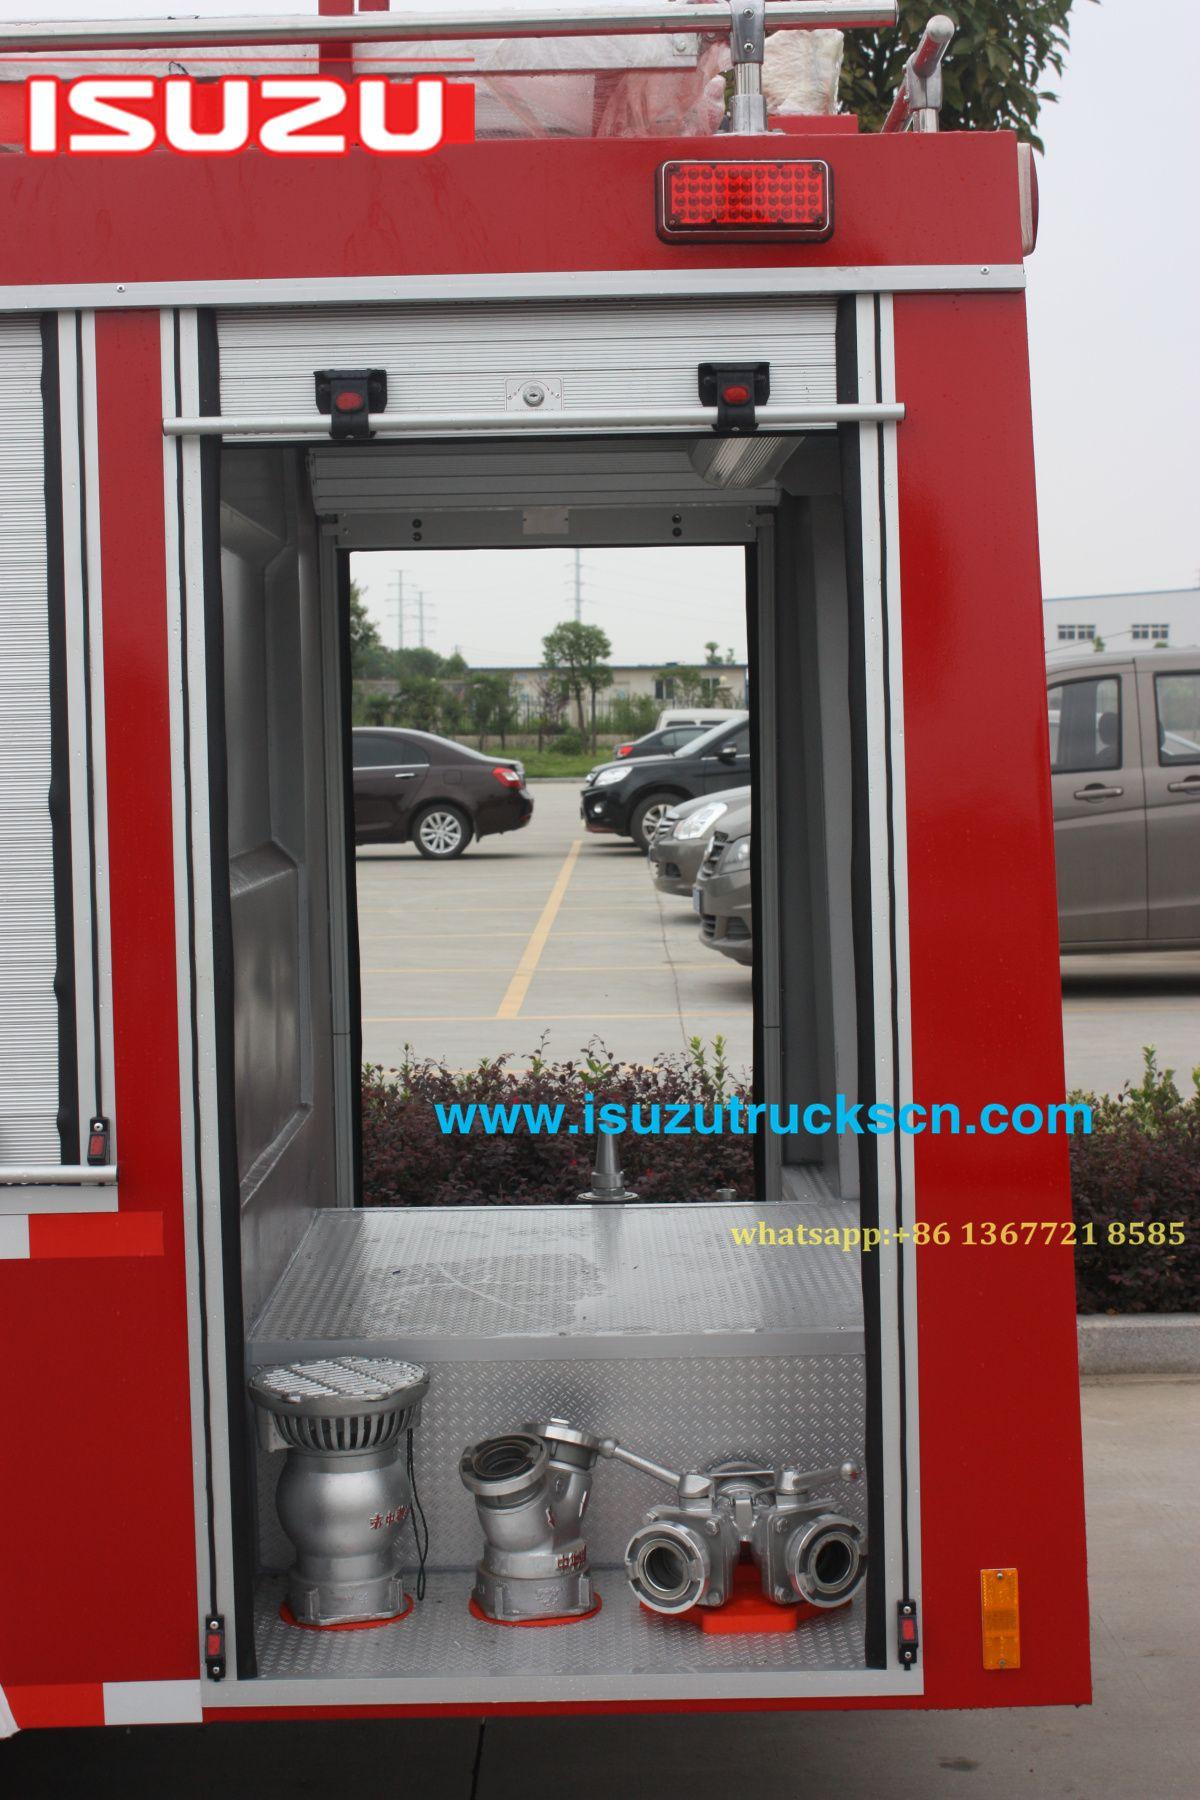 Philippines custom made ISUZU Fire Water Tank Truck, Fire